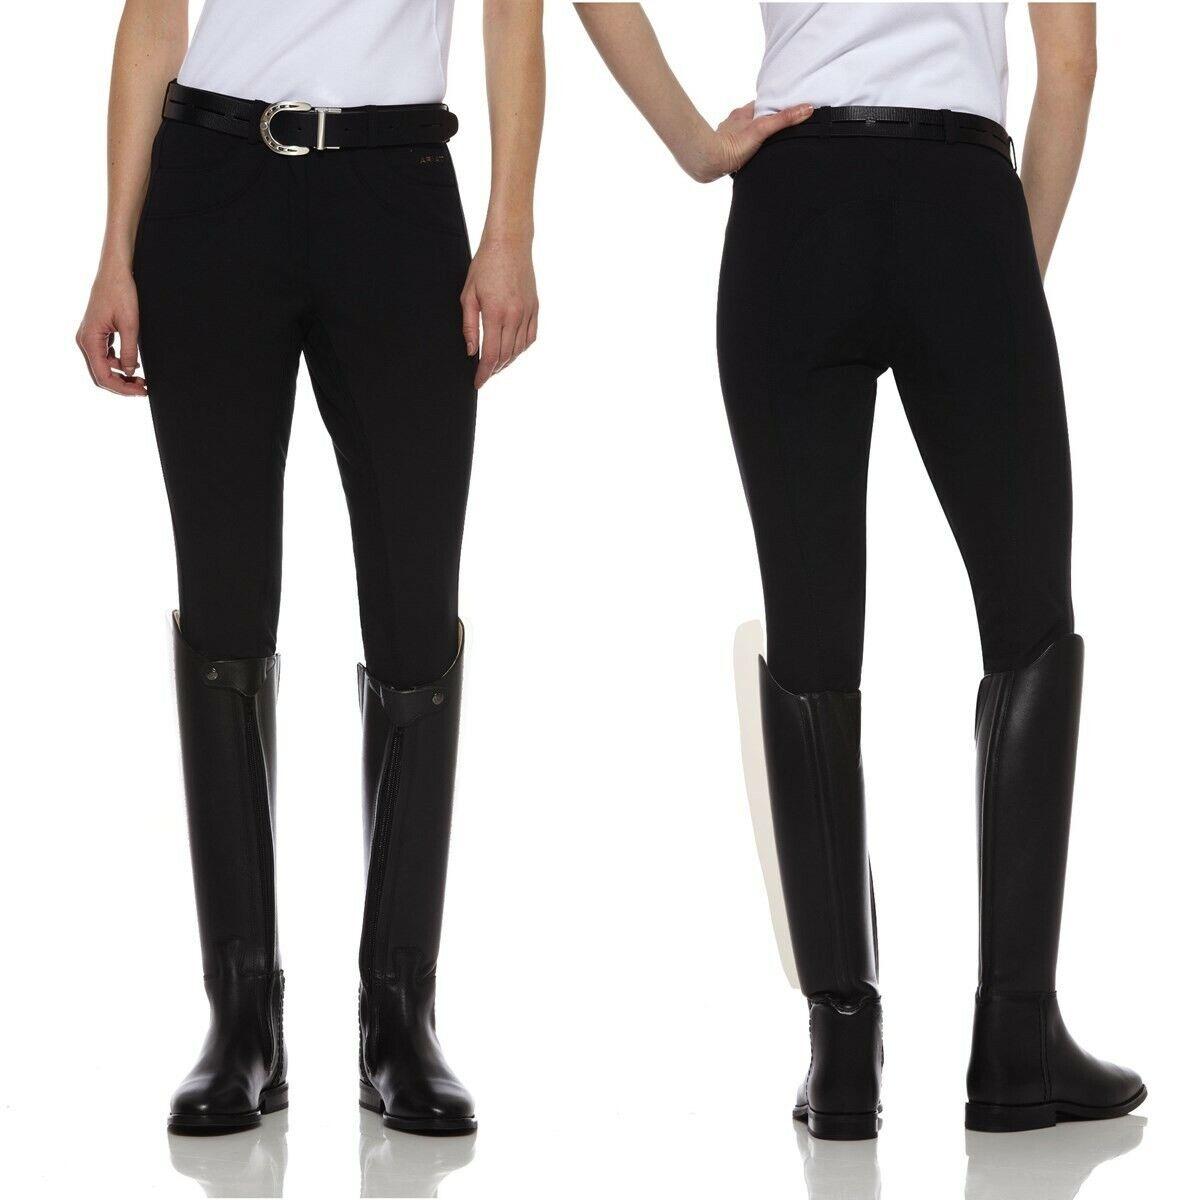 Ariat Olympia Complet Siège Pantalon-Noir-UK 10